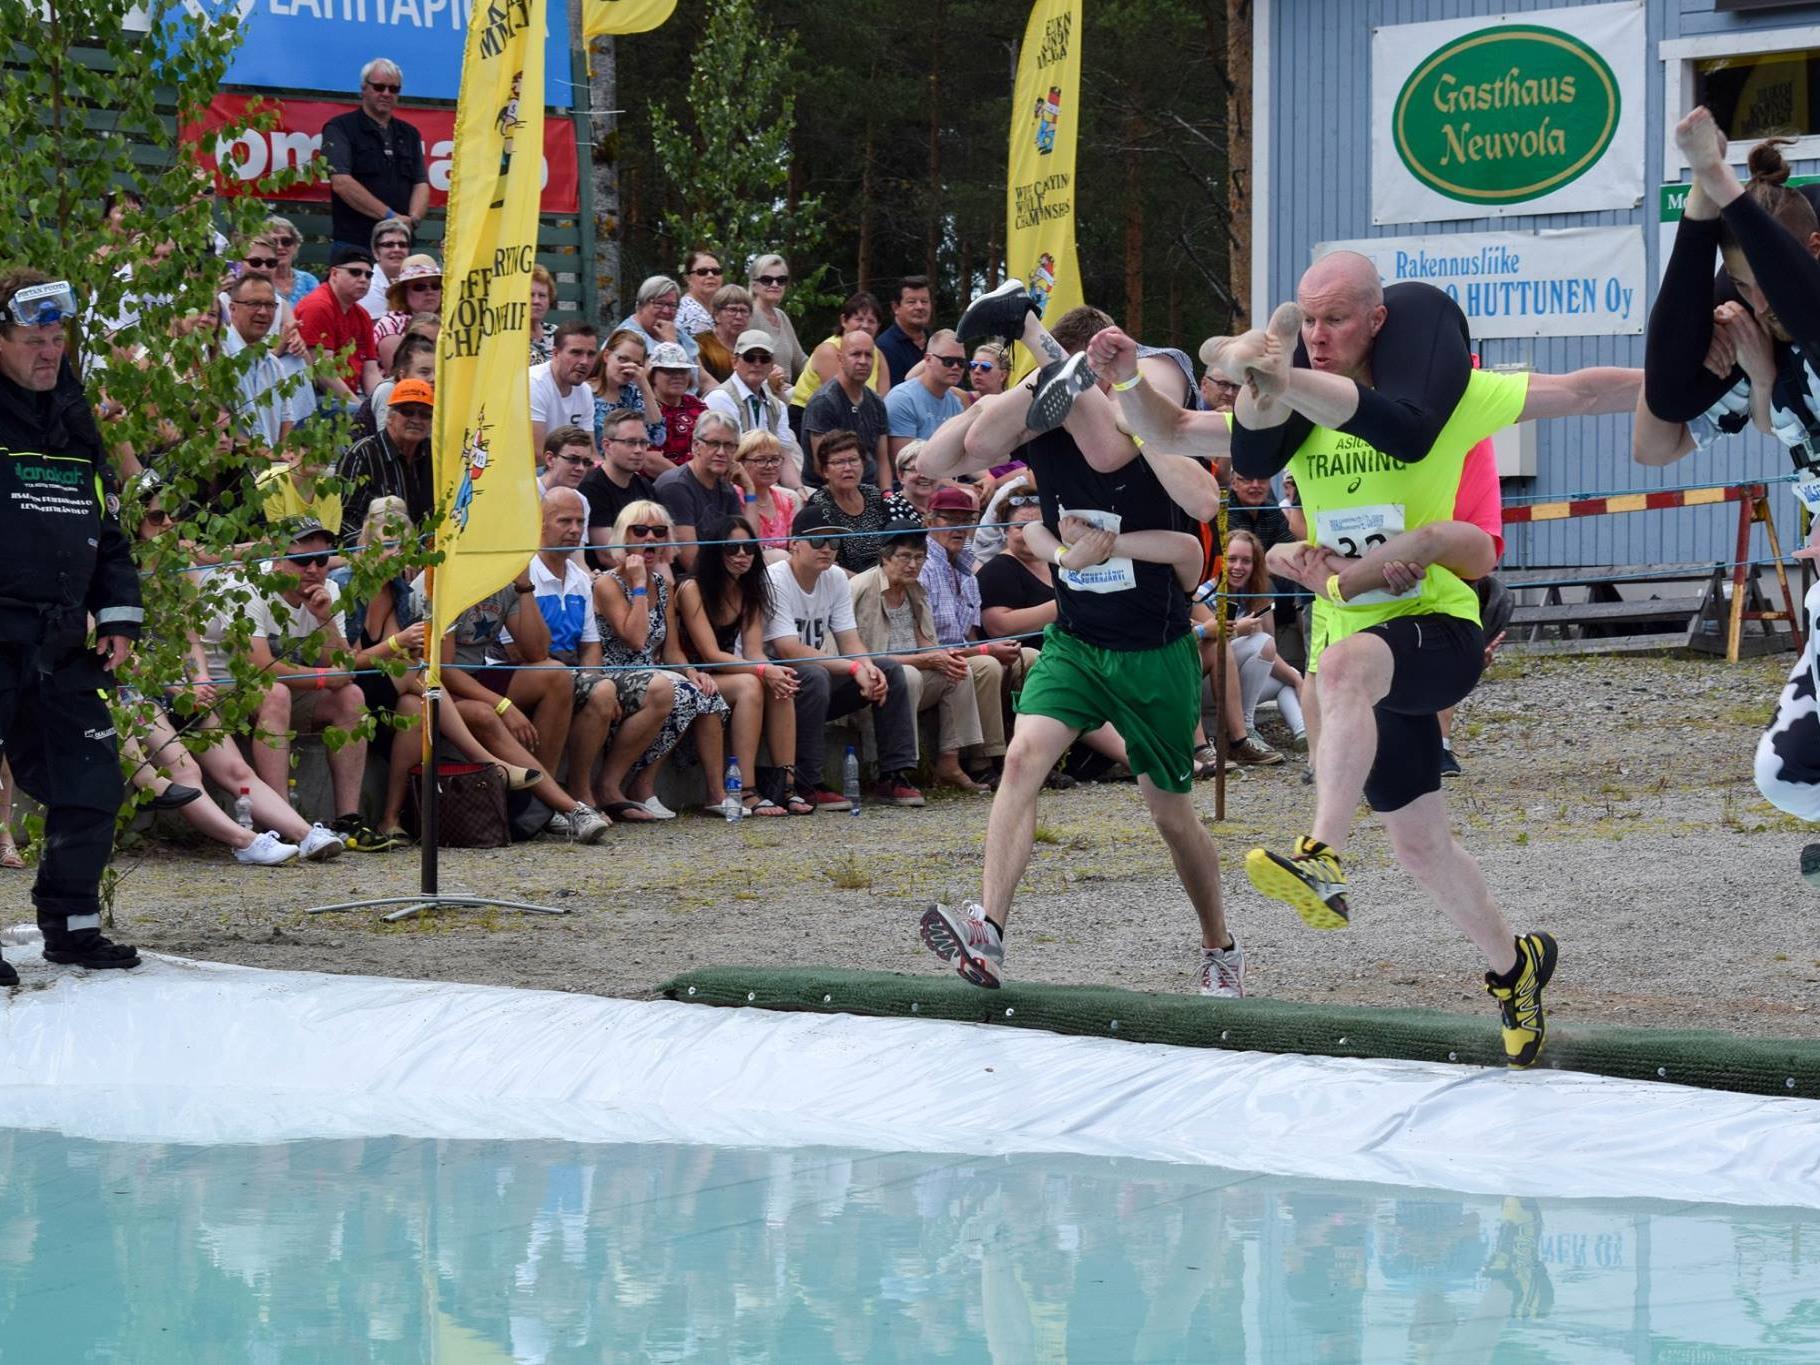 Kurioser Wettkampf in Finnland.